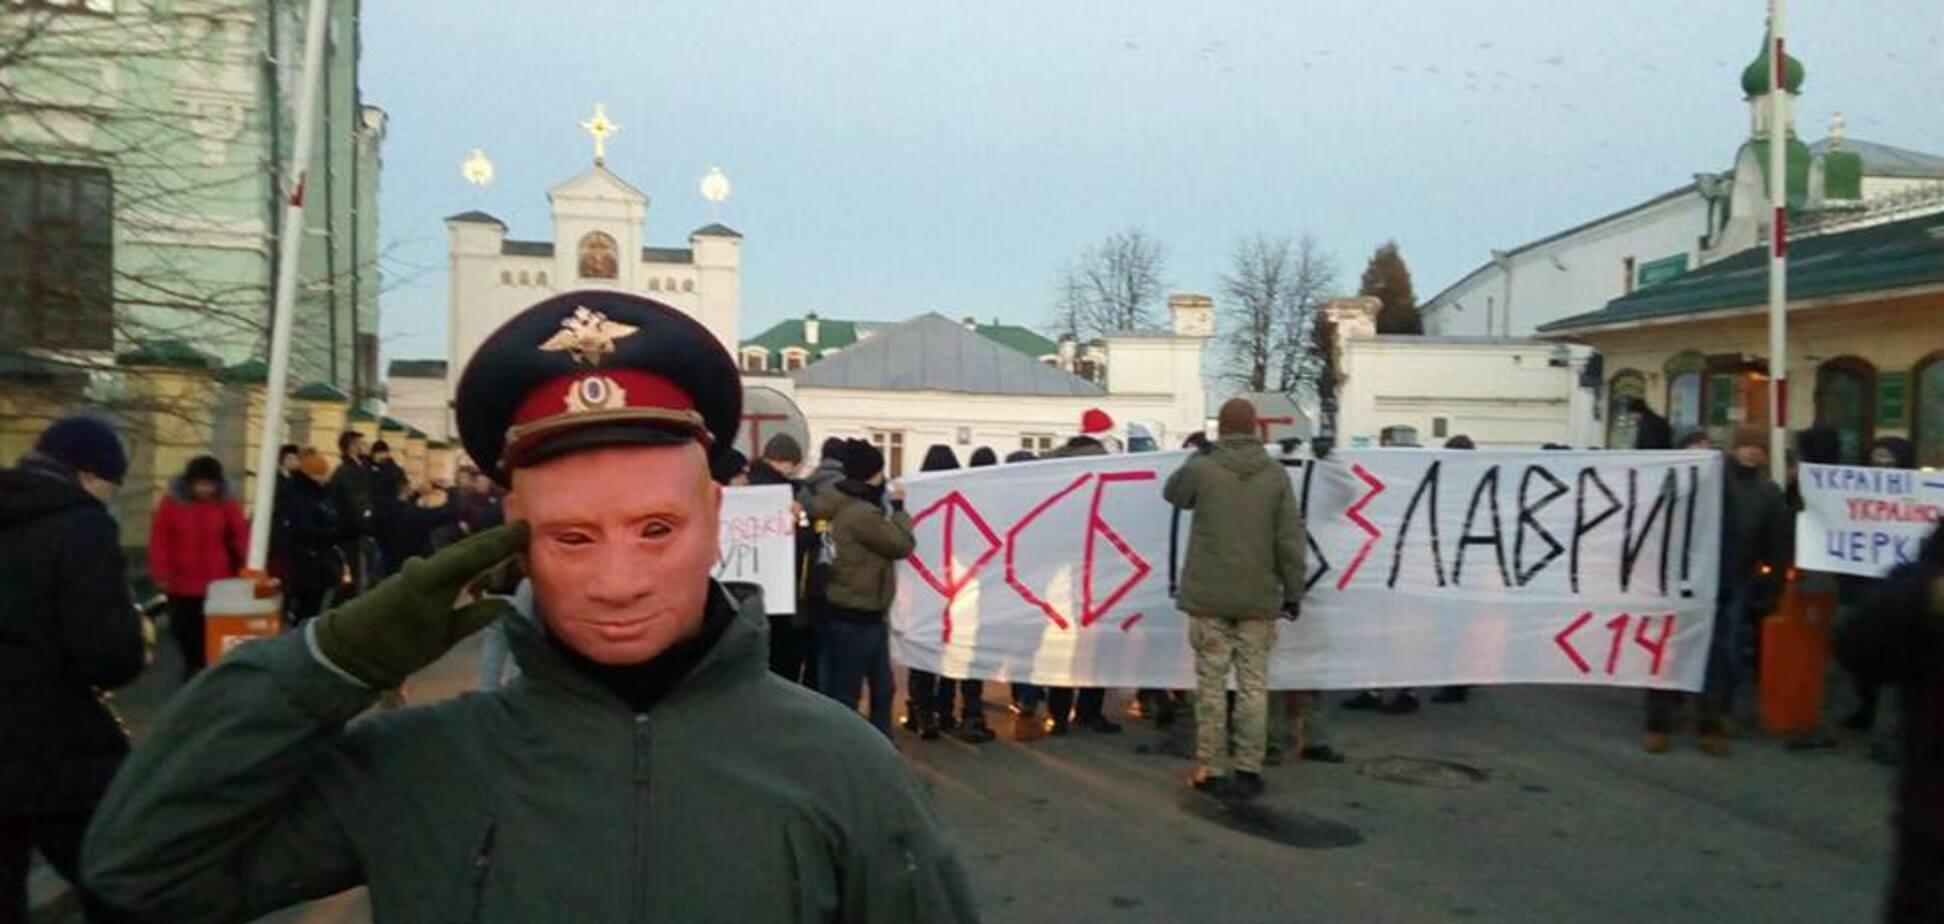 Путин, введи войска в Киев? Митрополит УПЦ МП предупредил об опасности